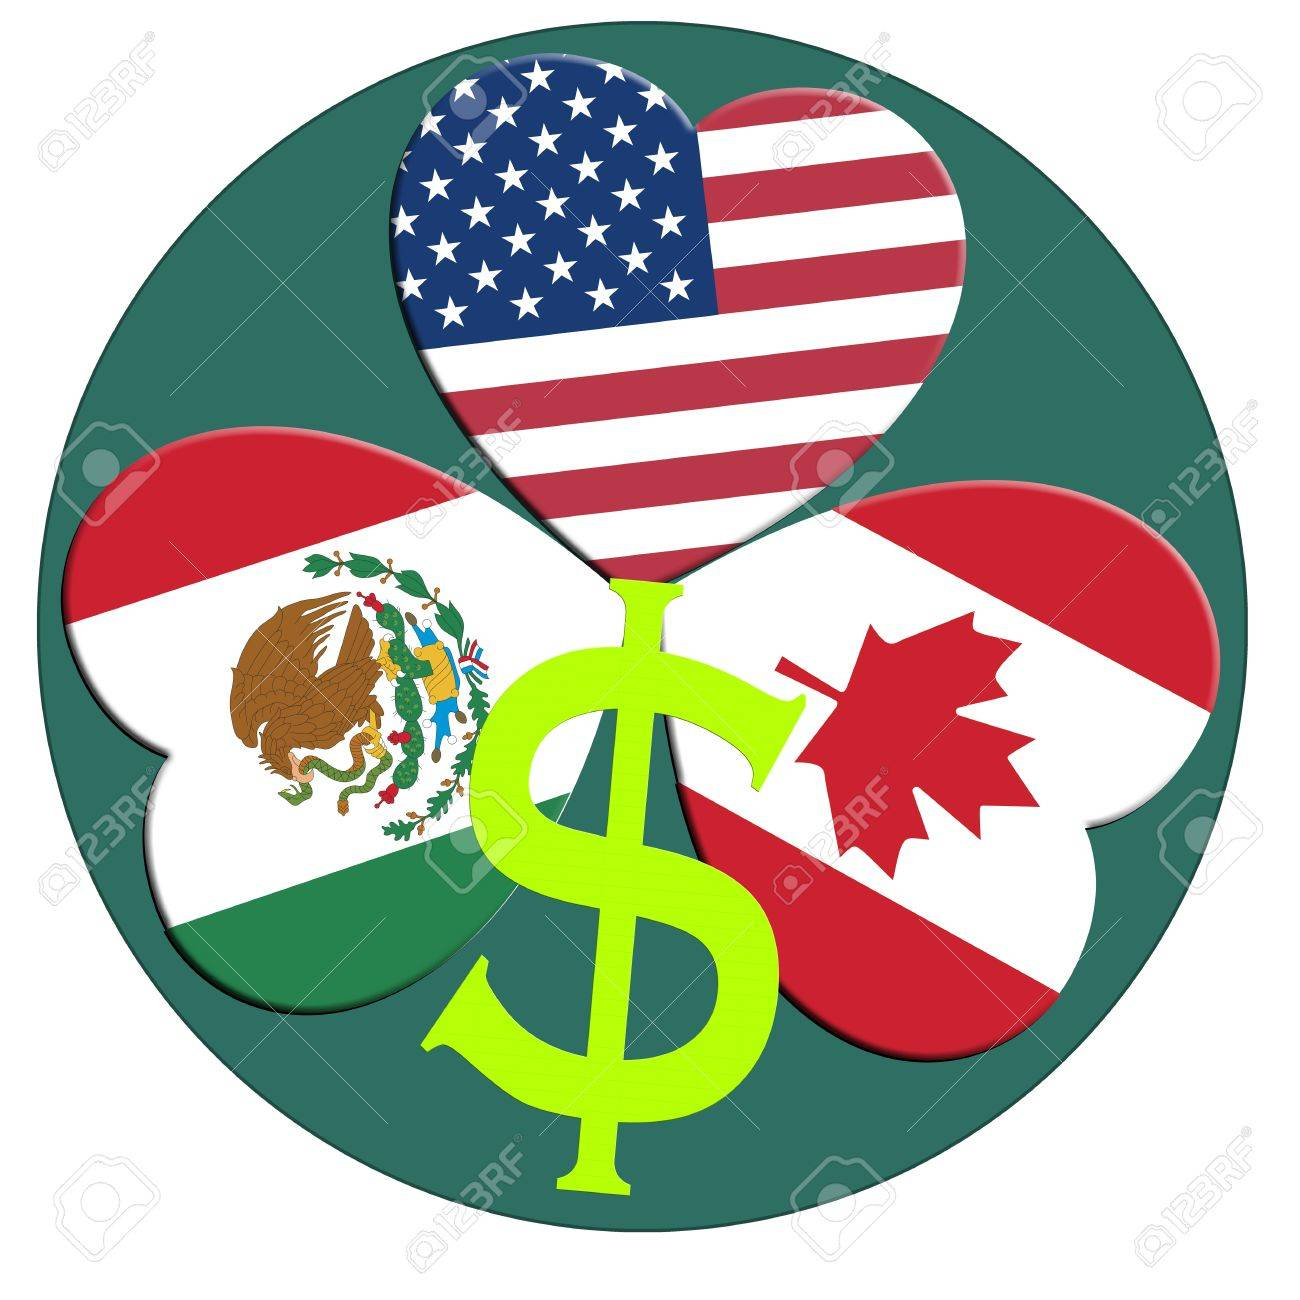 NAFTA, North American Free Trade Agreement between Canada, Mexico, USA Stock Photo - 17031528